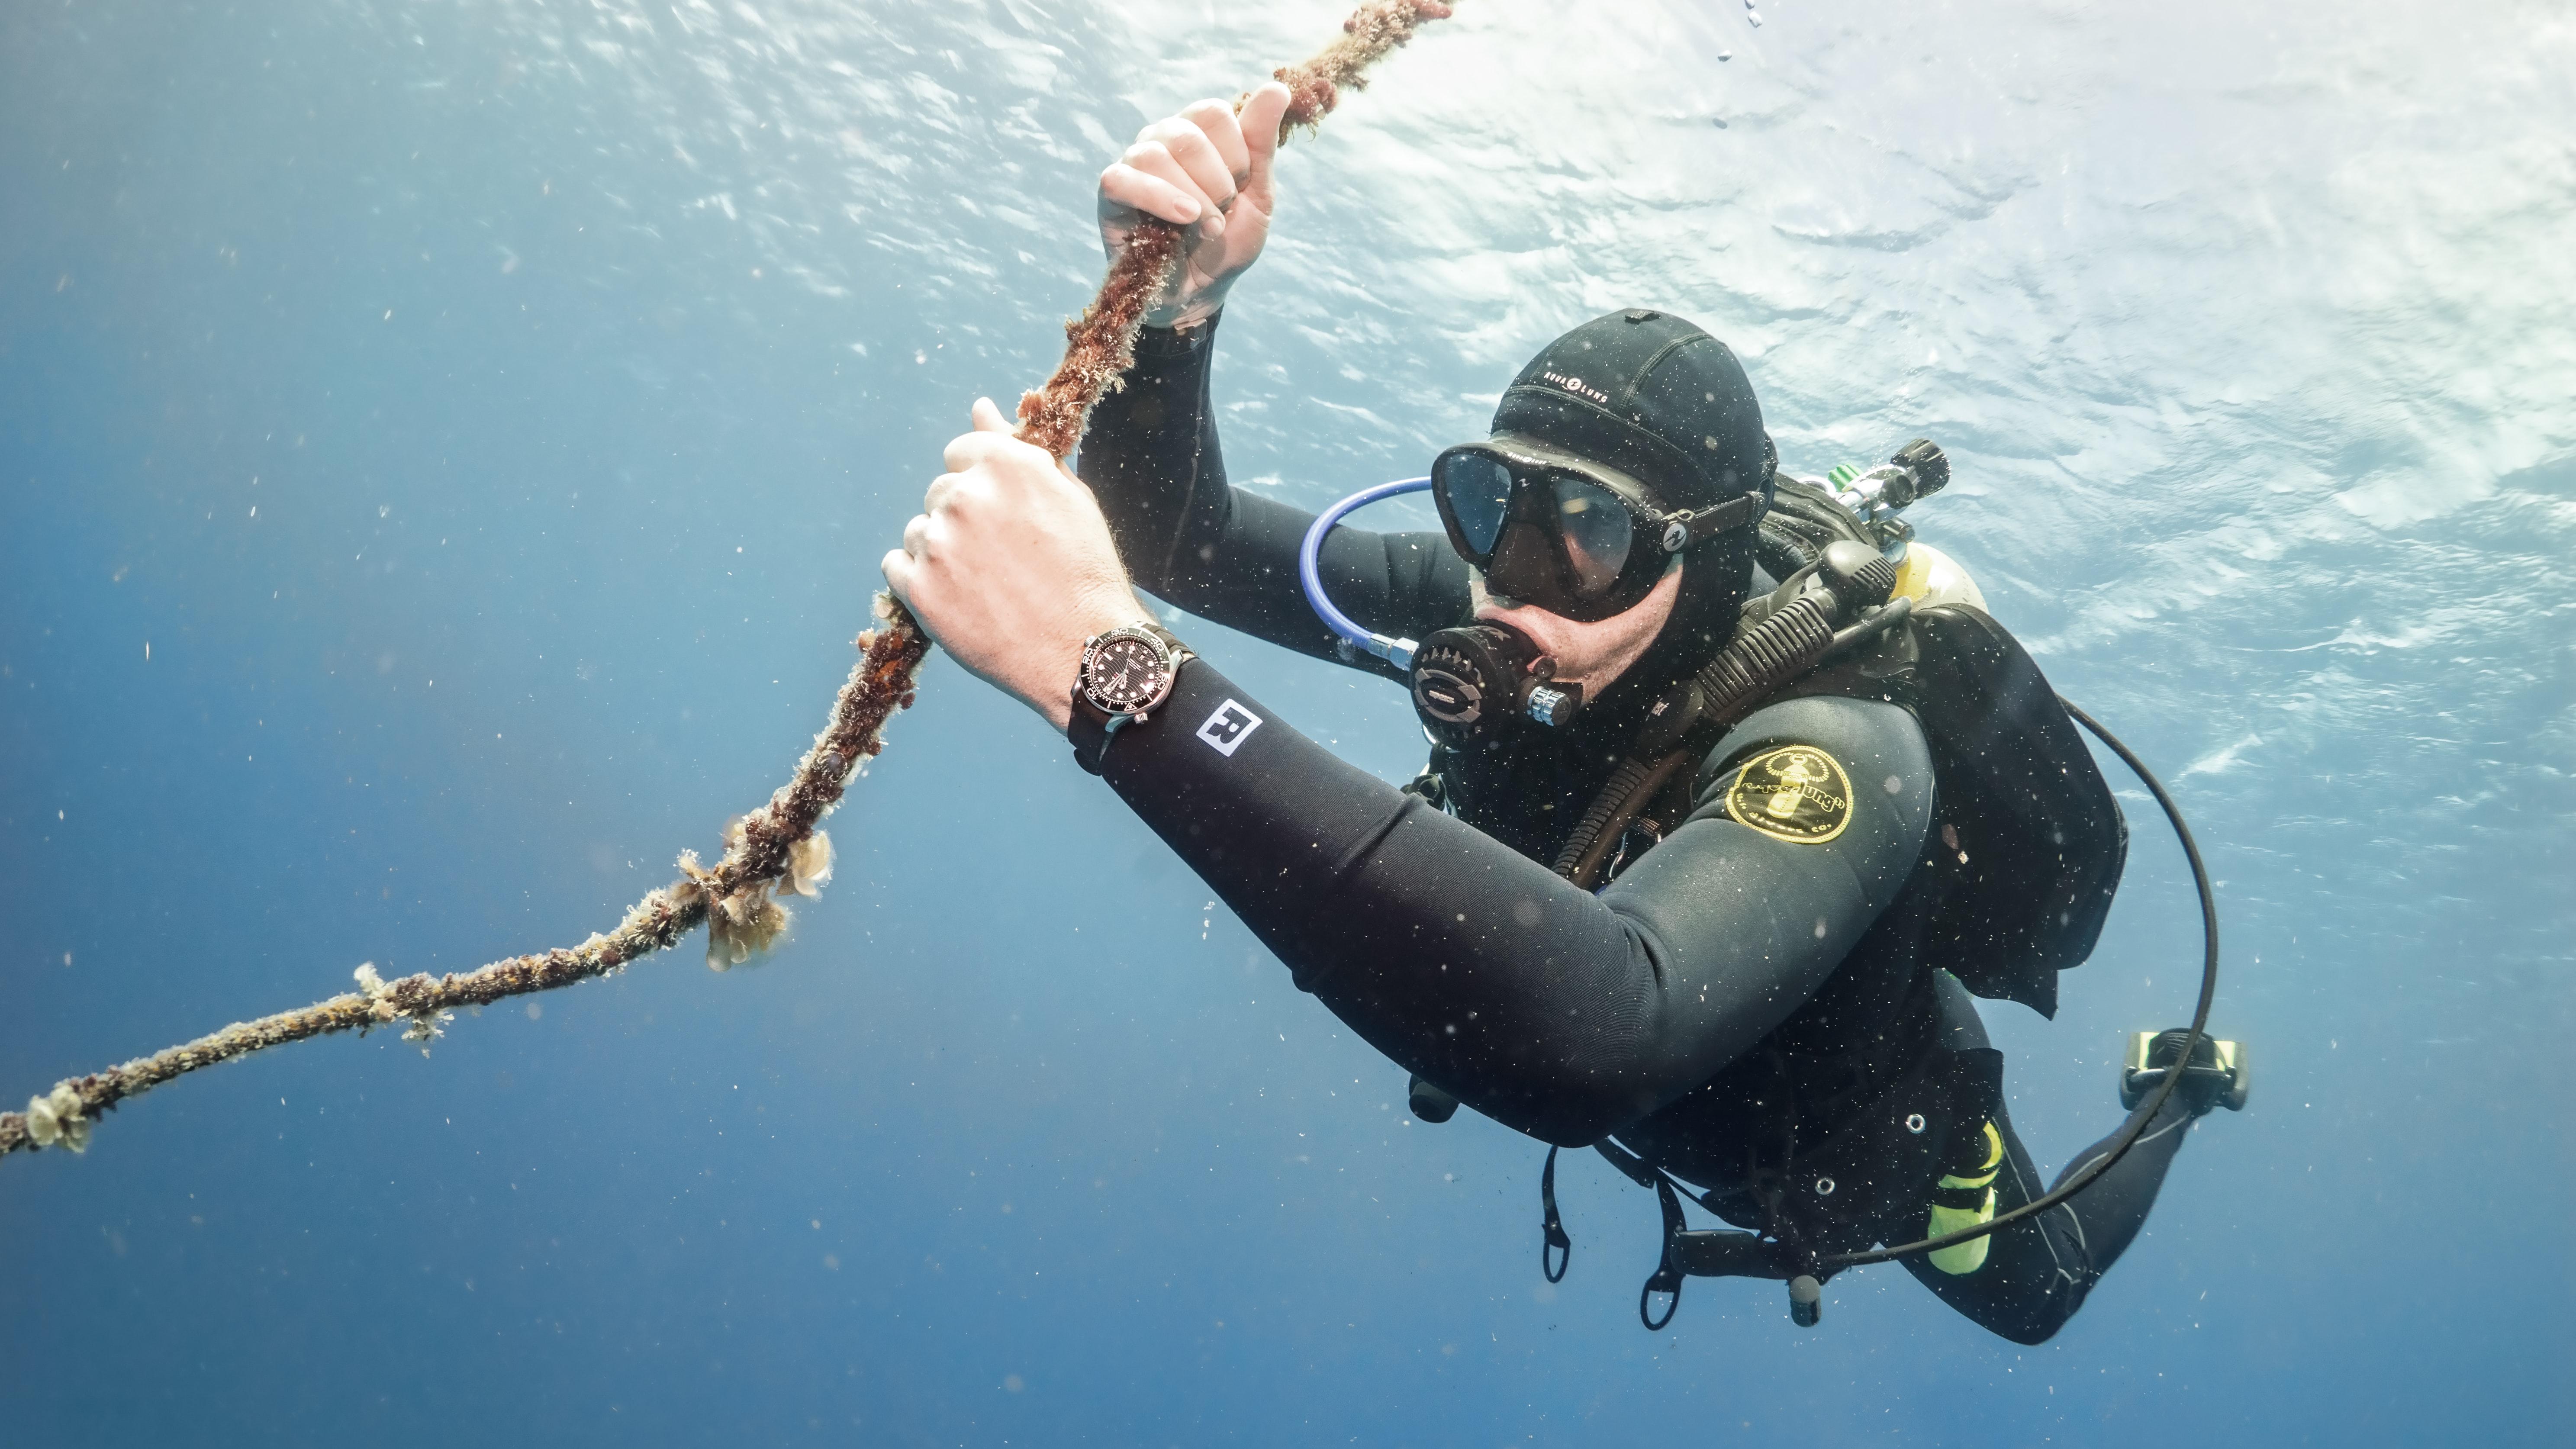 Sm300 pro uw 1.jpg?ixlib=rails 1.1  In-Depth: Diving With The Omega Seamaster Professional 300M SM300 Pro UW 1